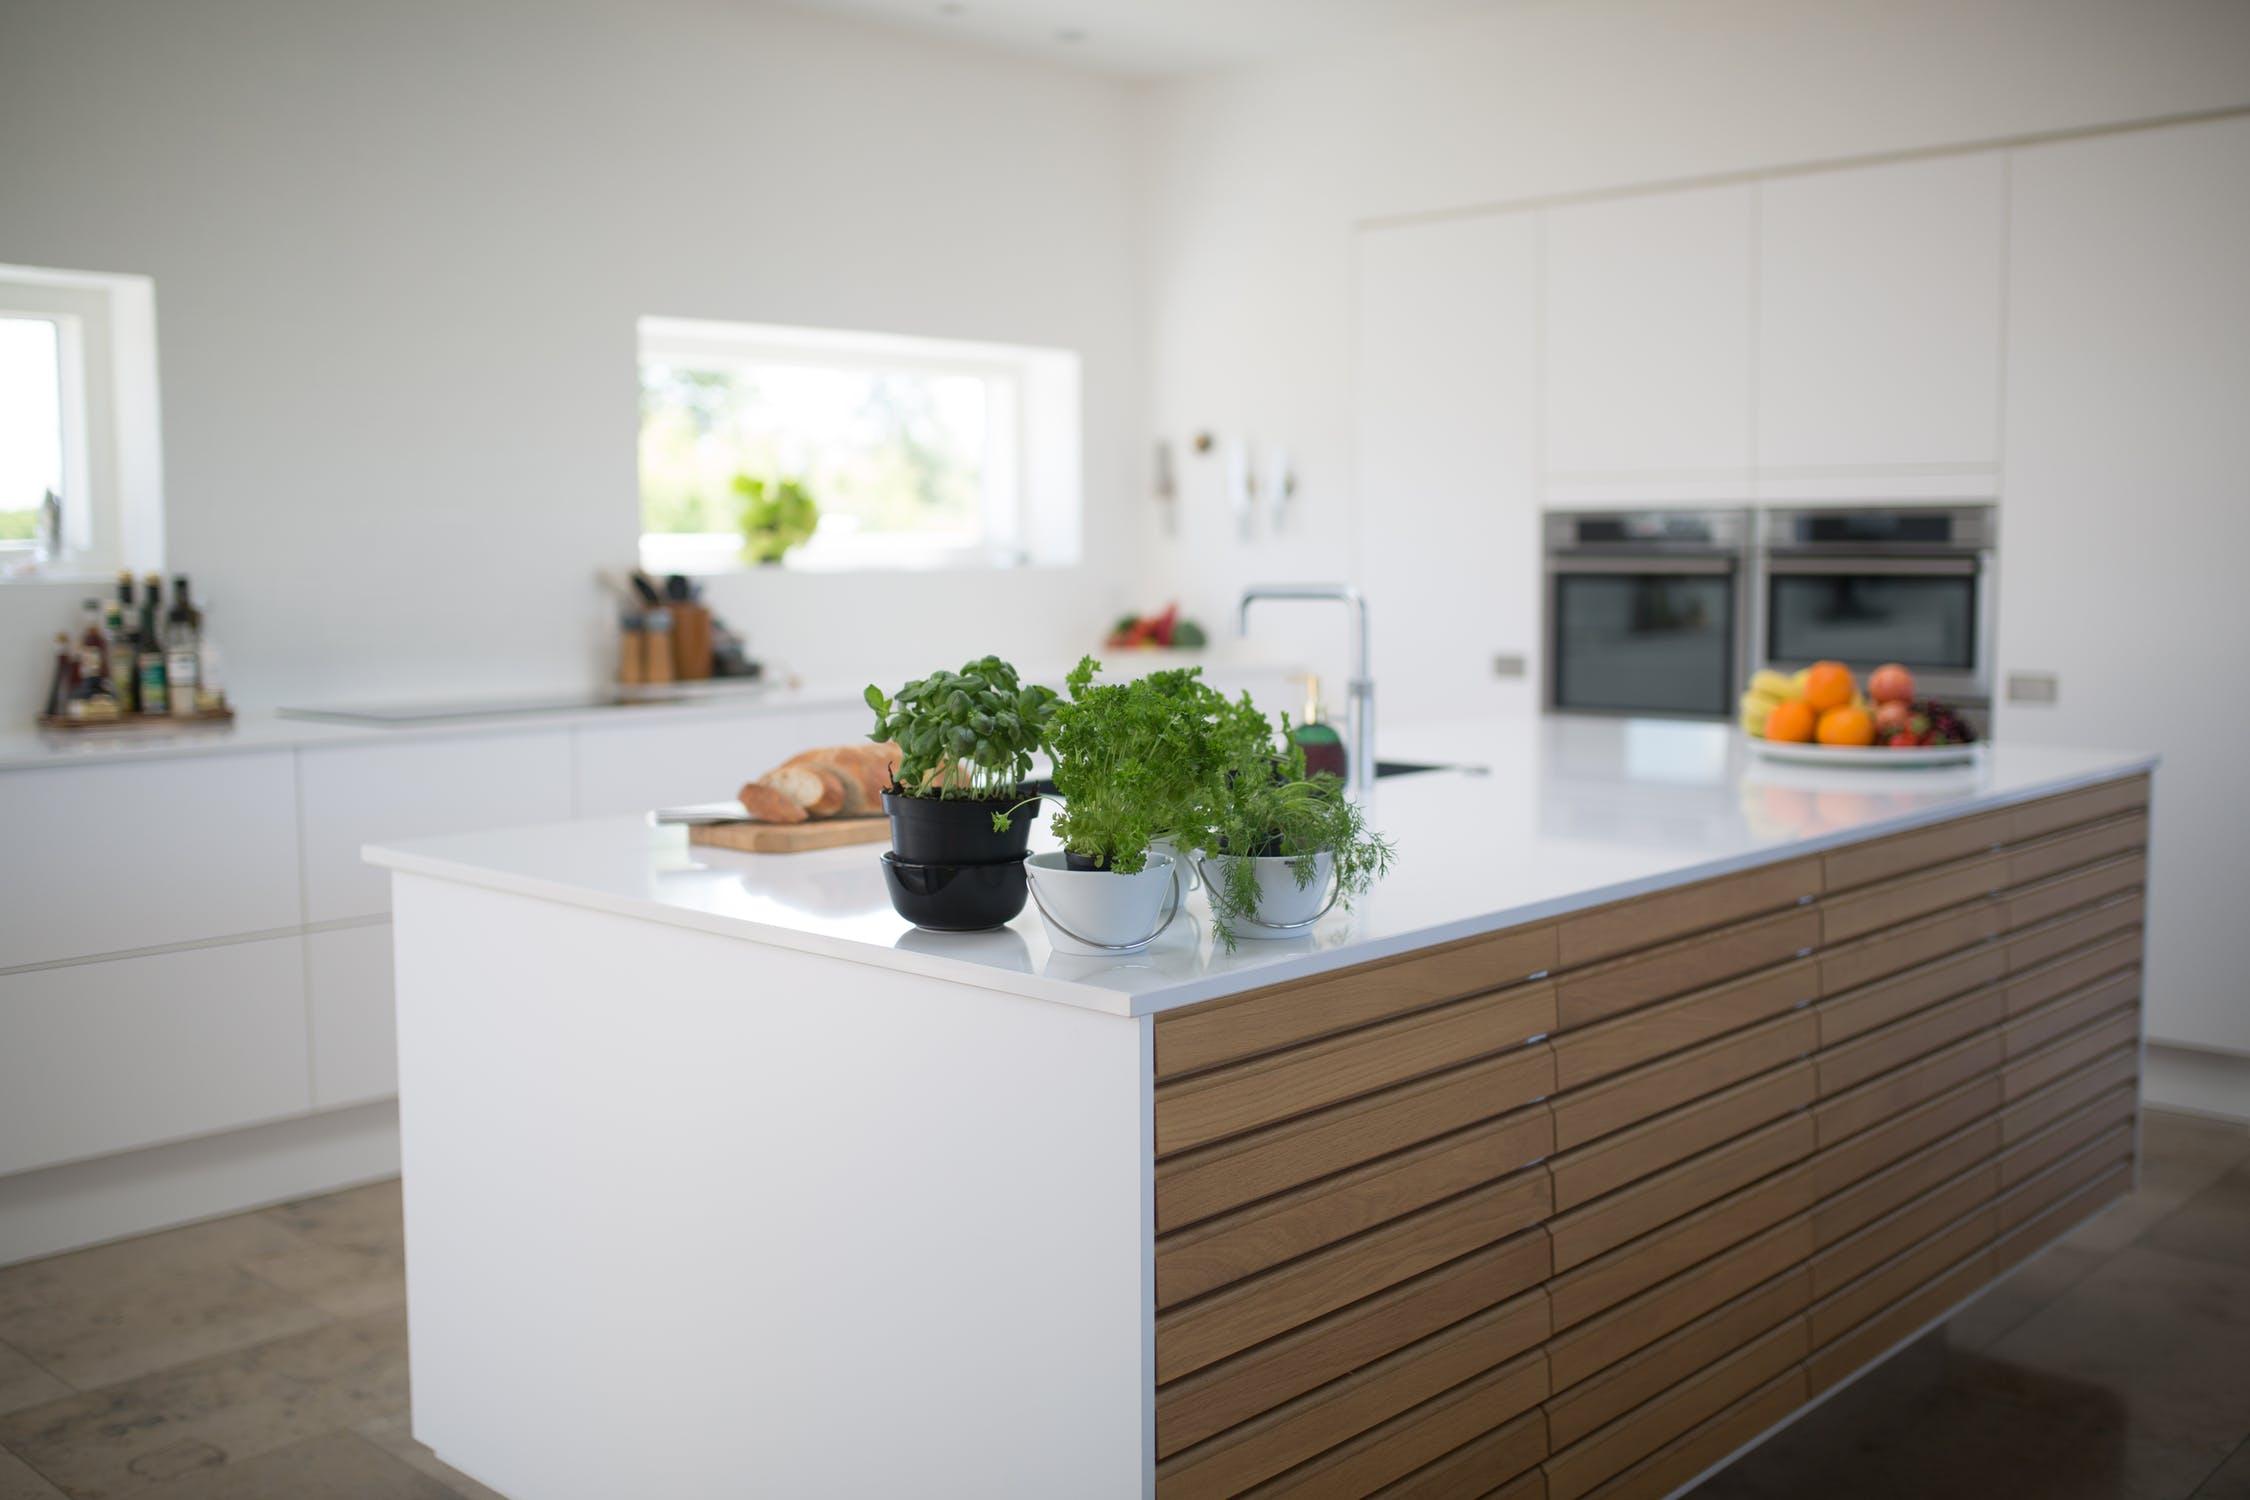 Badkamer Witten Schimmel : Waterafstotende verf badkamer keuken of buitenmuur coating